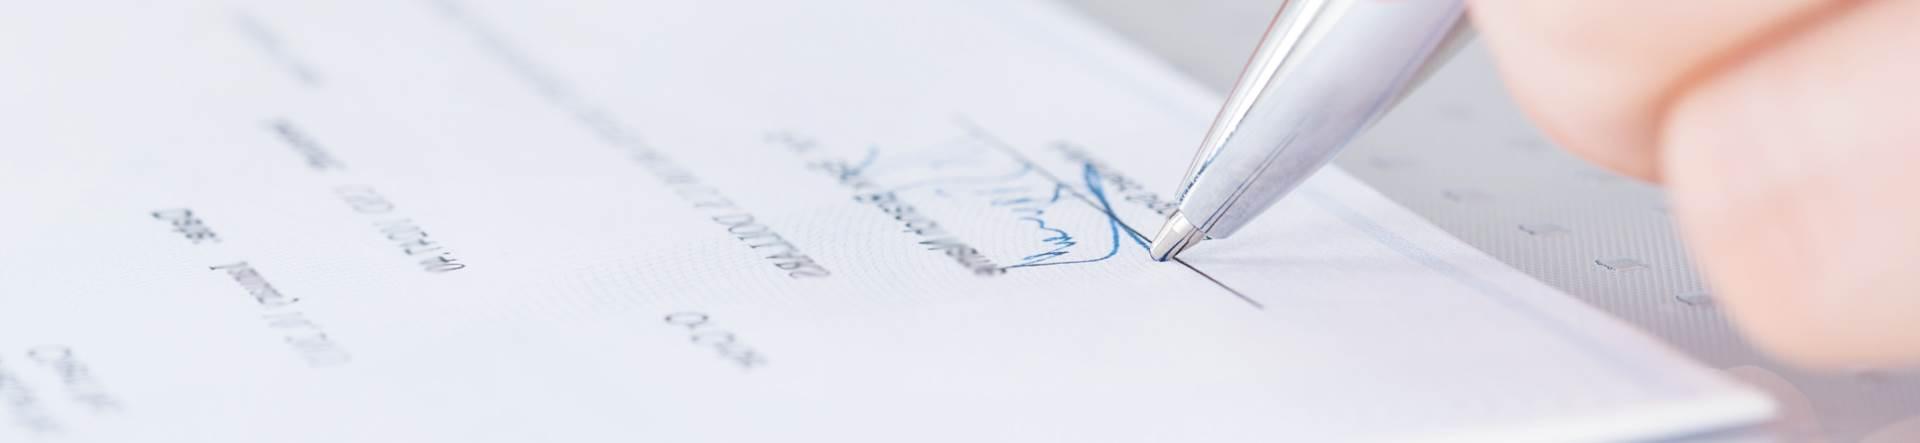 passo a passo como preencher cheques diversos bancos